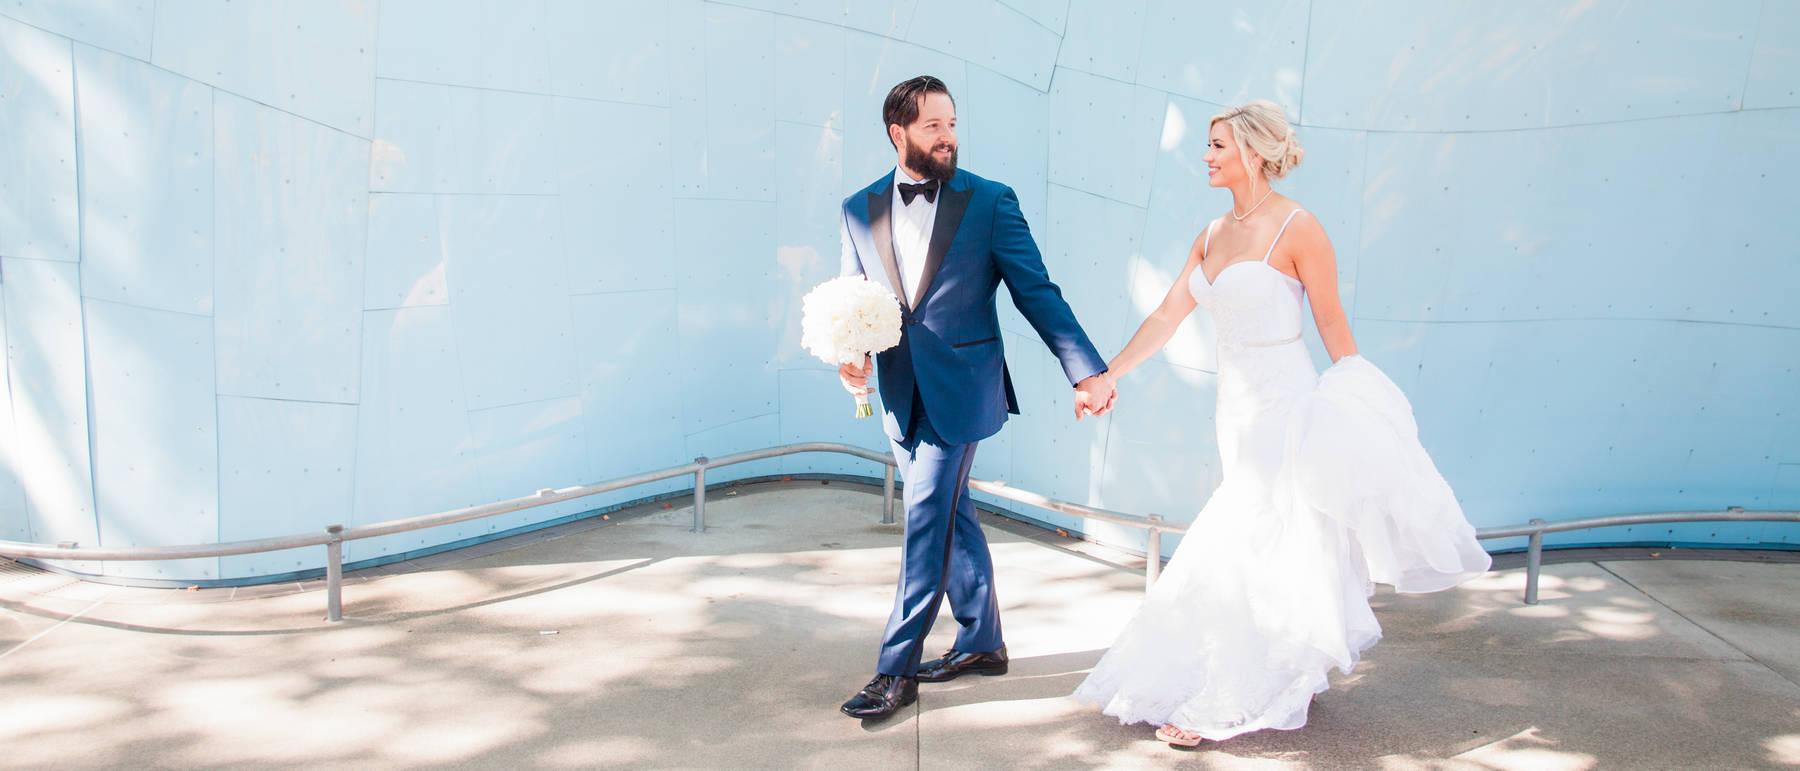 johnandjoseph-wedding-photographer-hz-slider-172